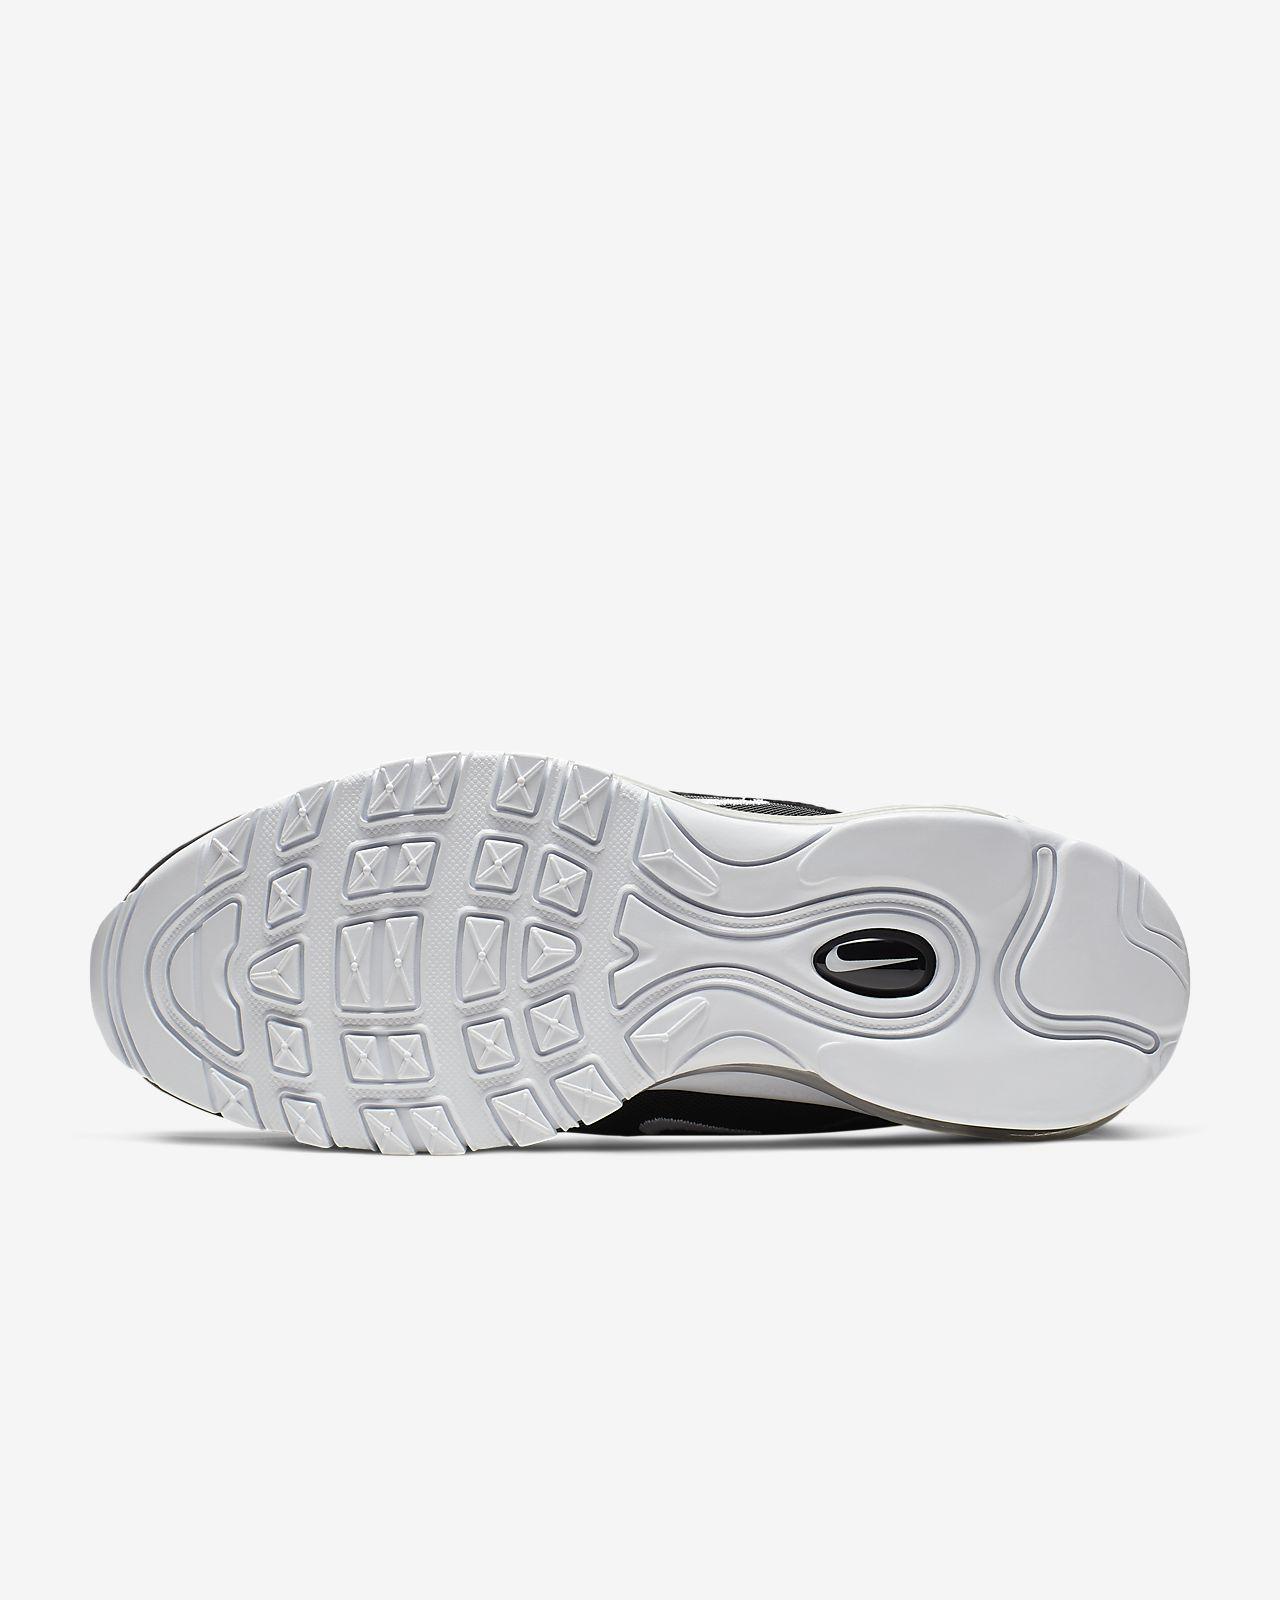 Nike Air Max 97 OG QS 921826 001